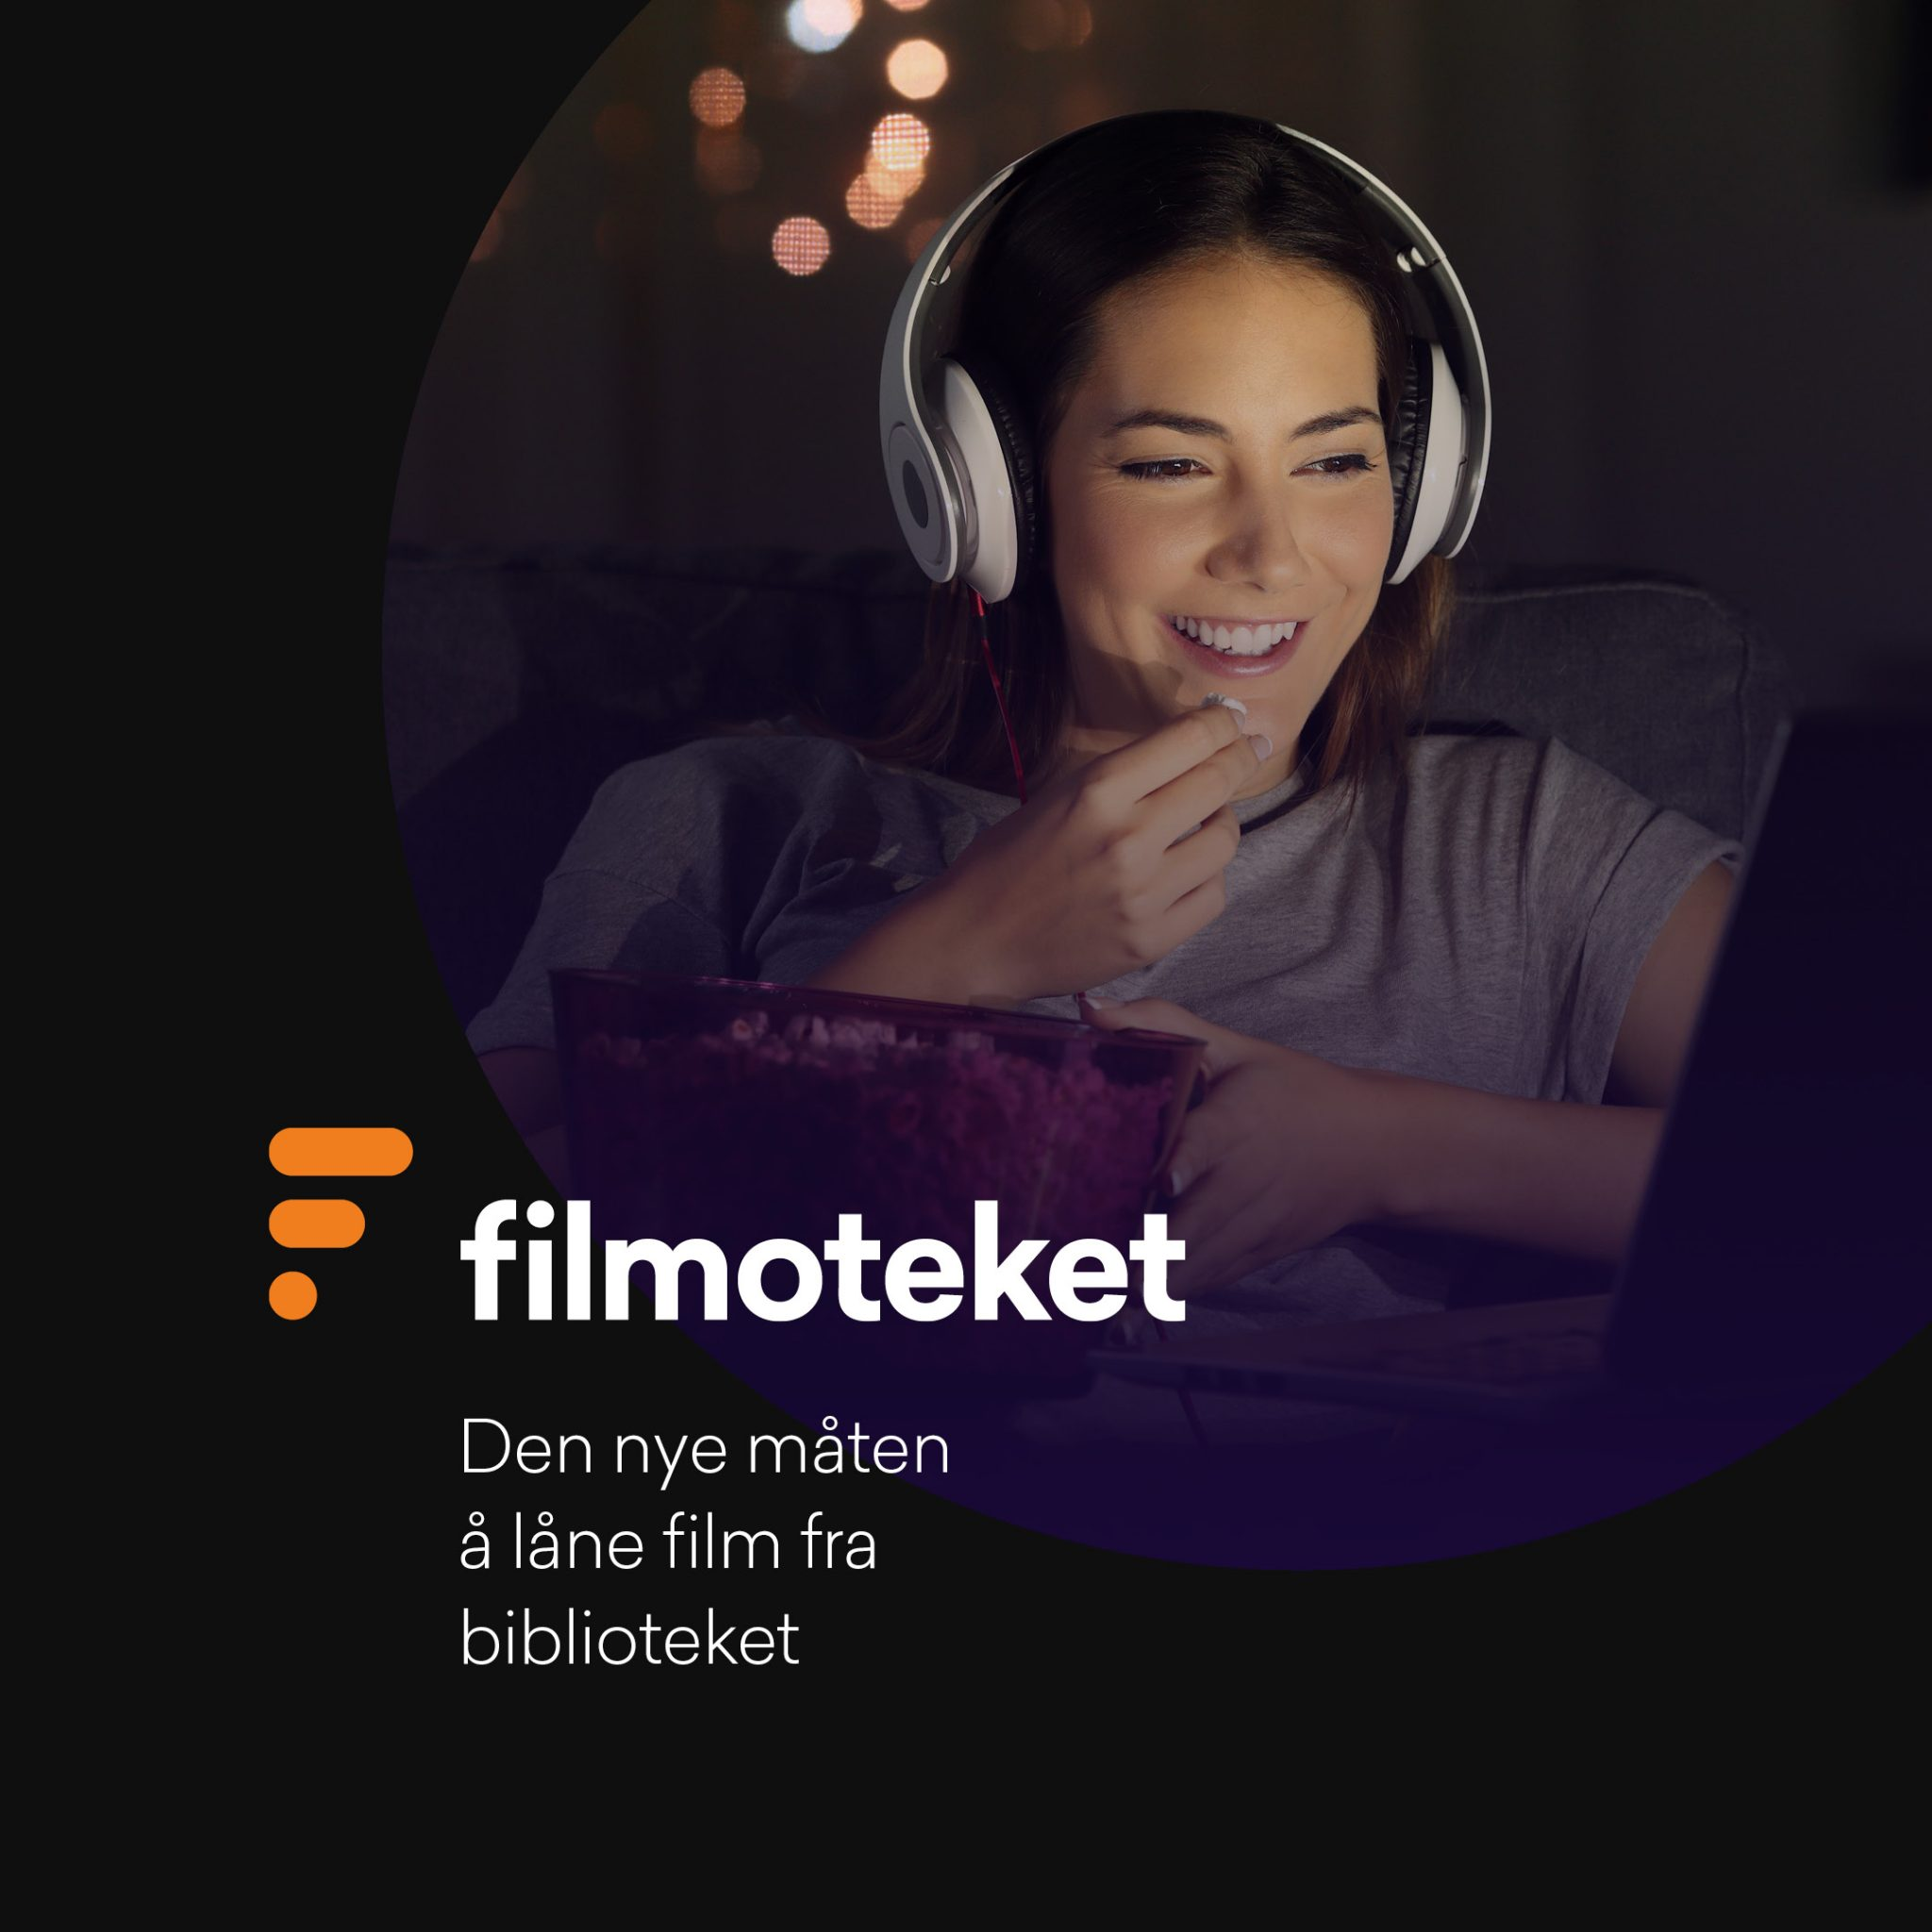 Filmoteket